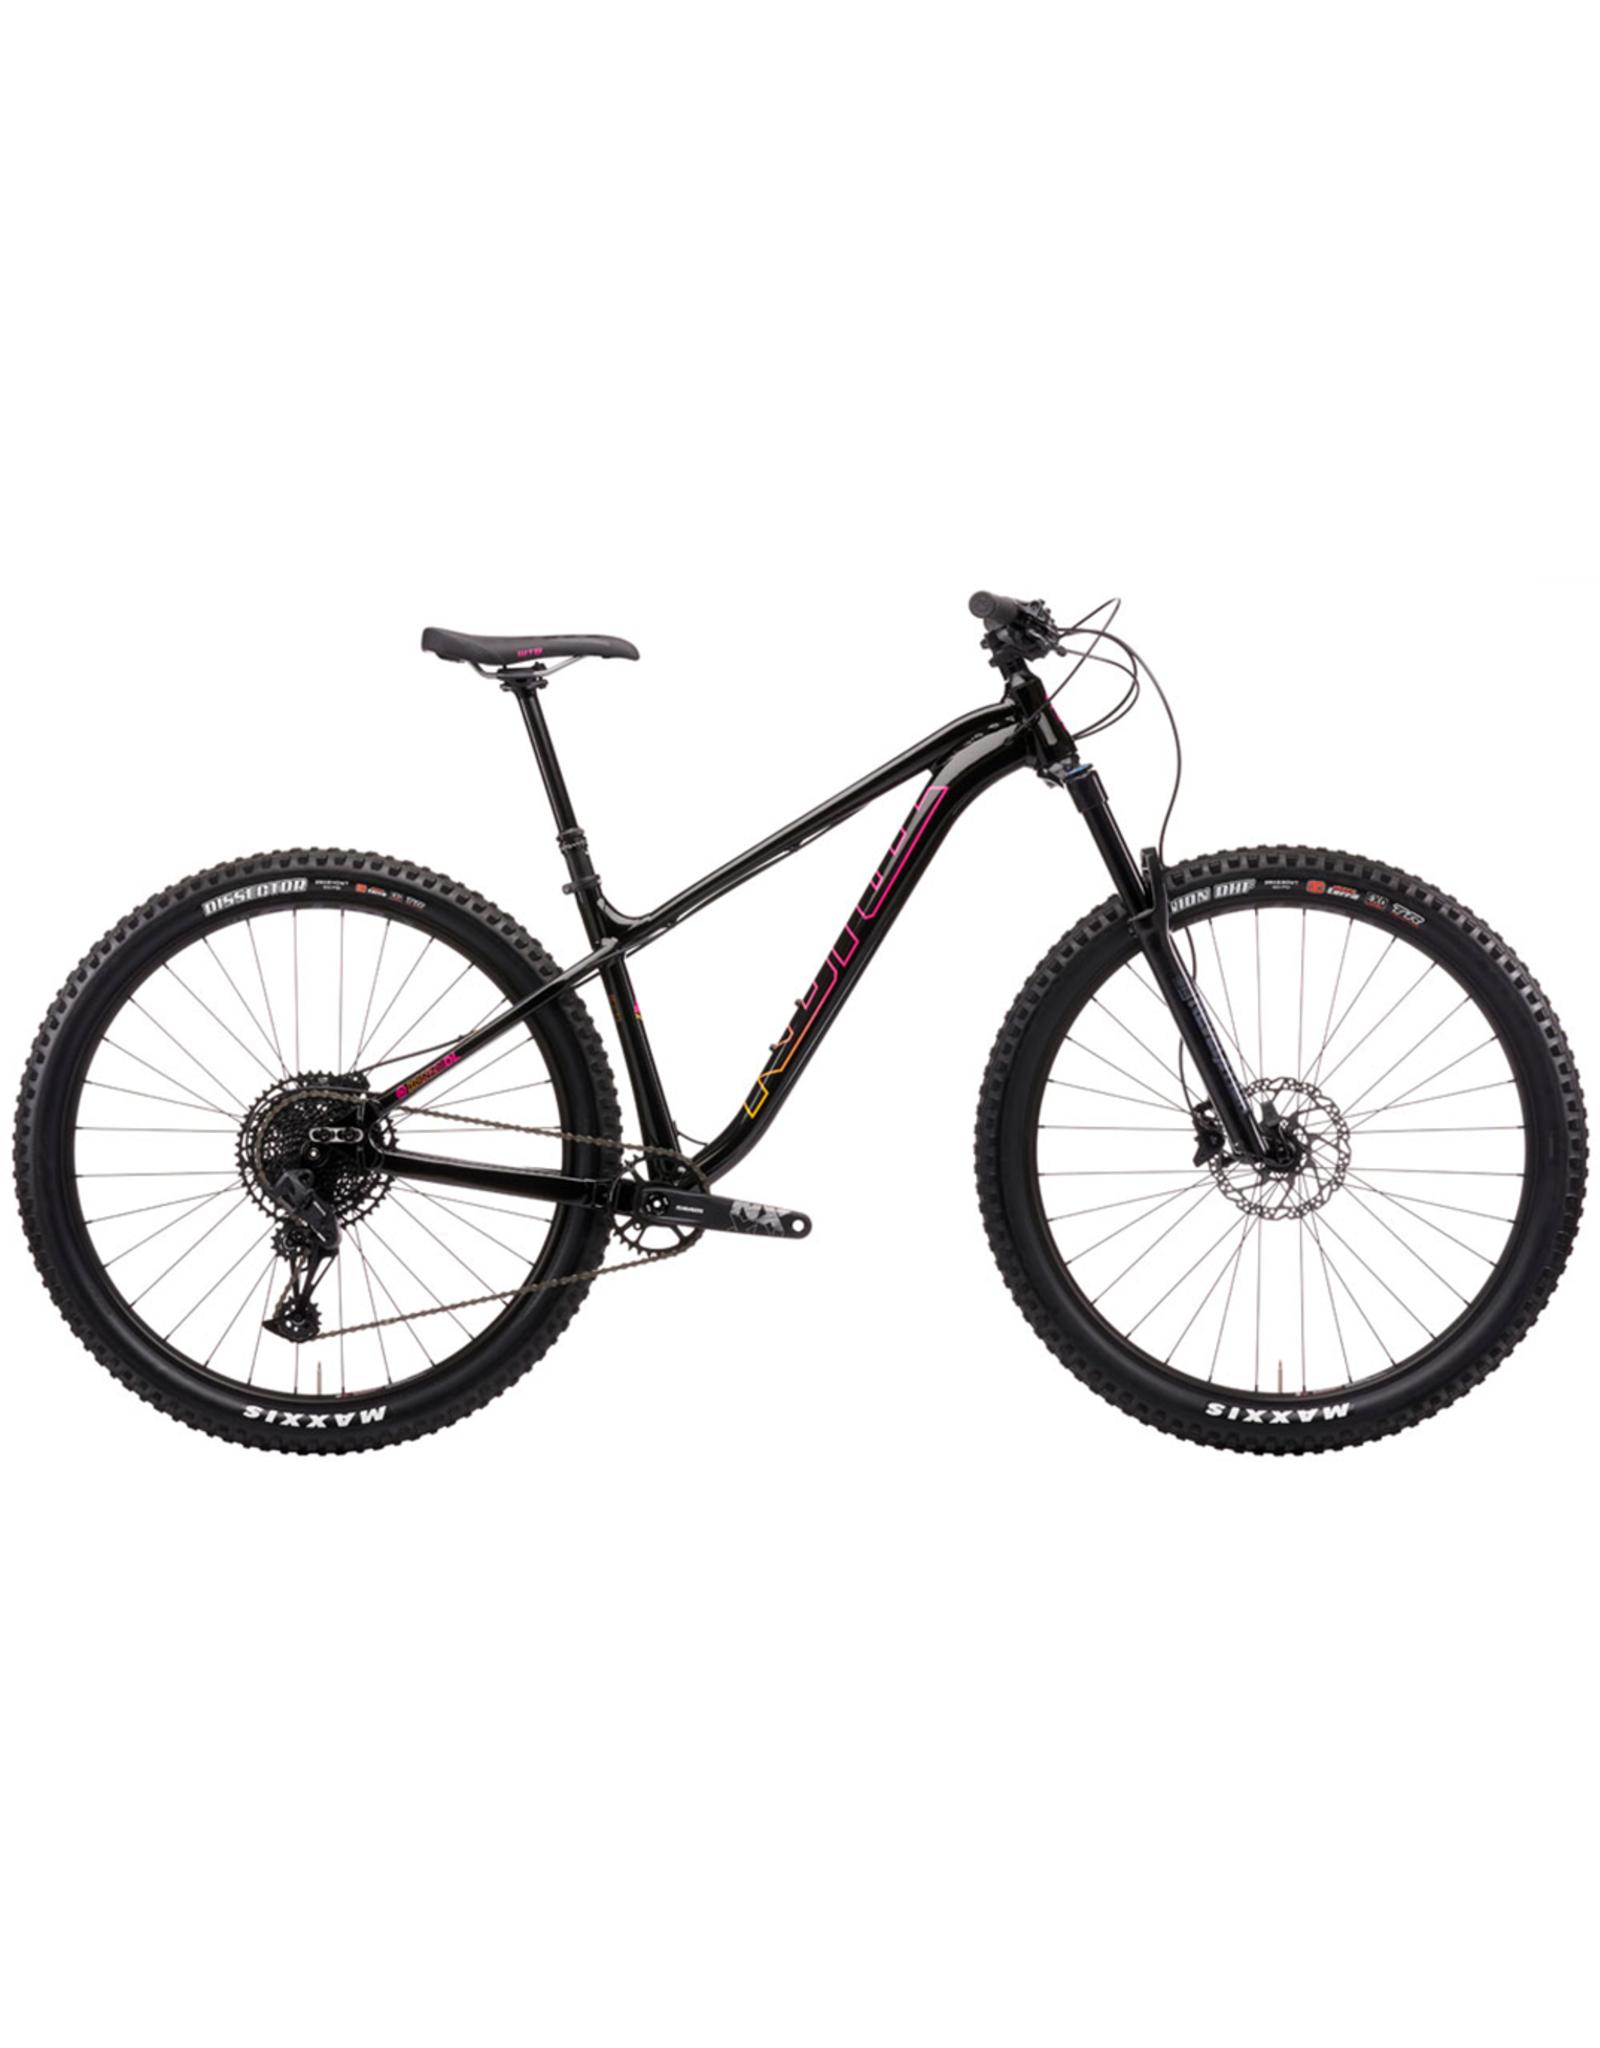 KONA Kona Honzo DL Complete Bike